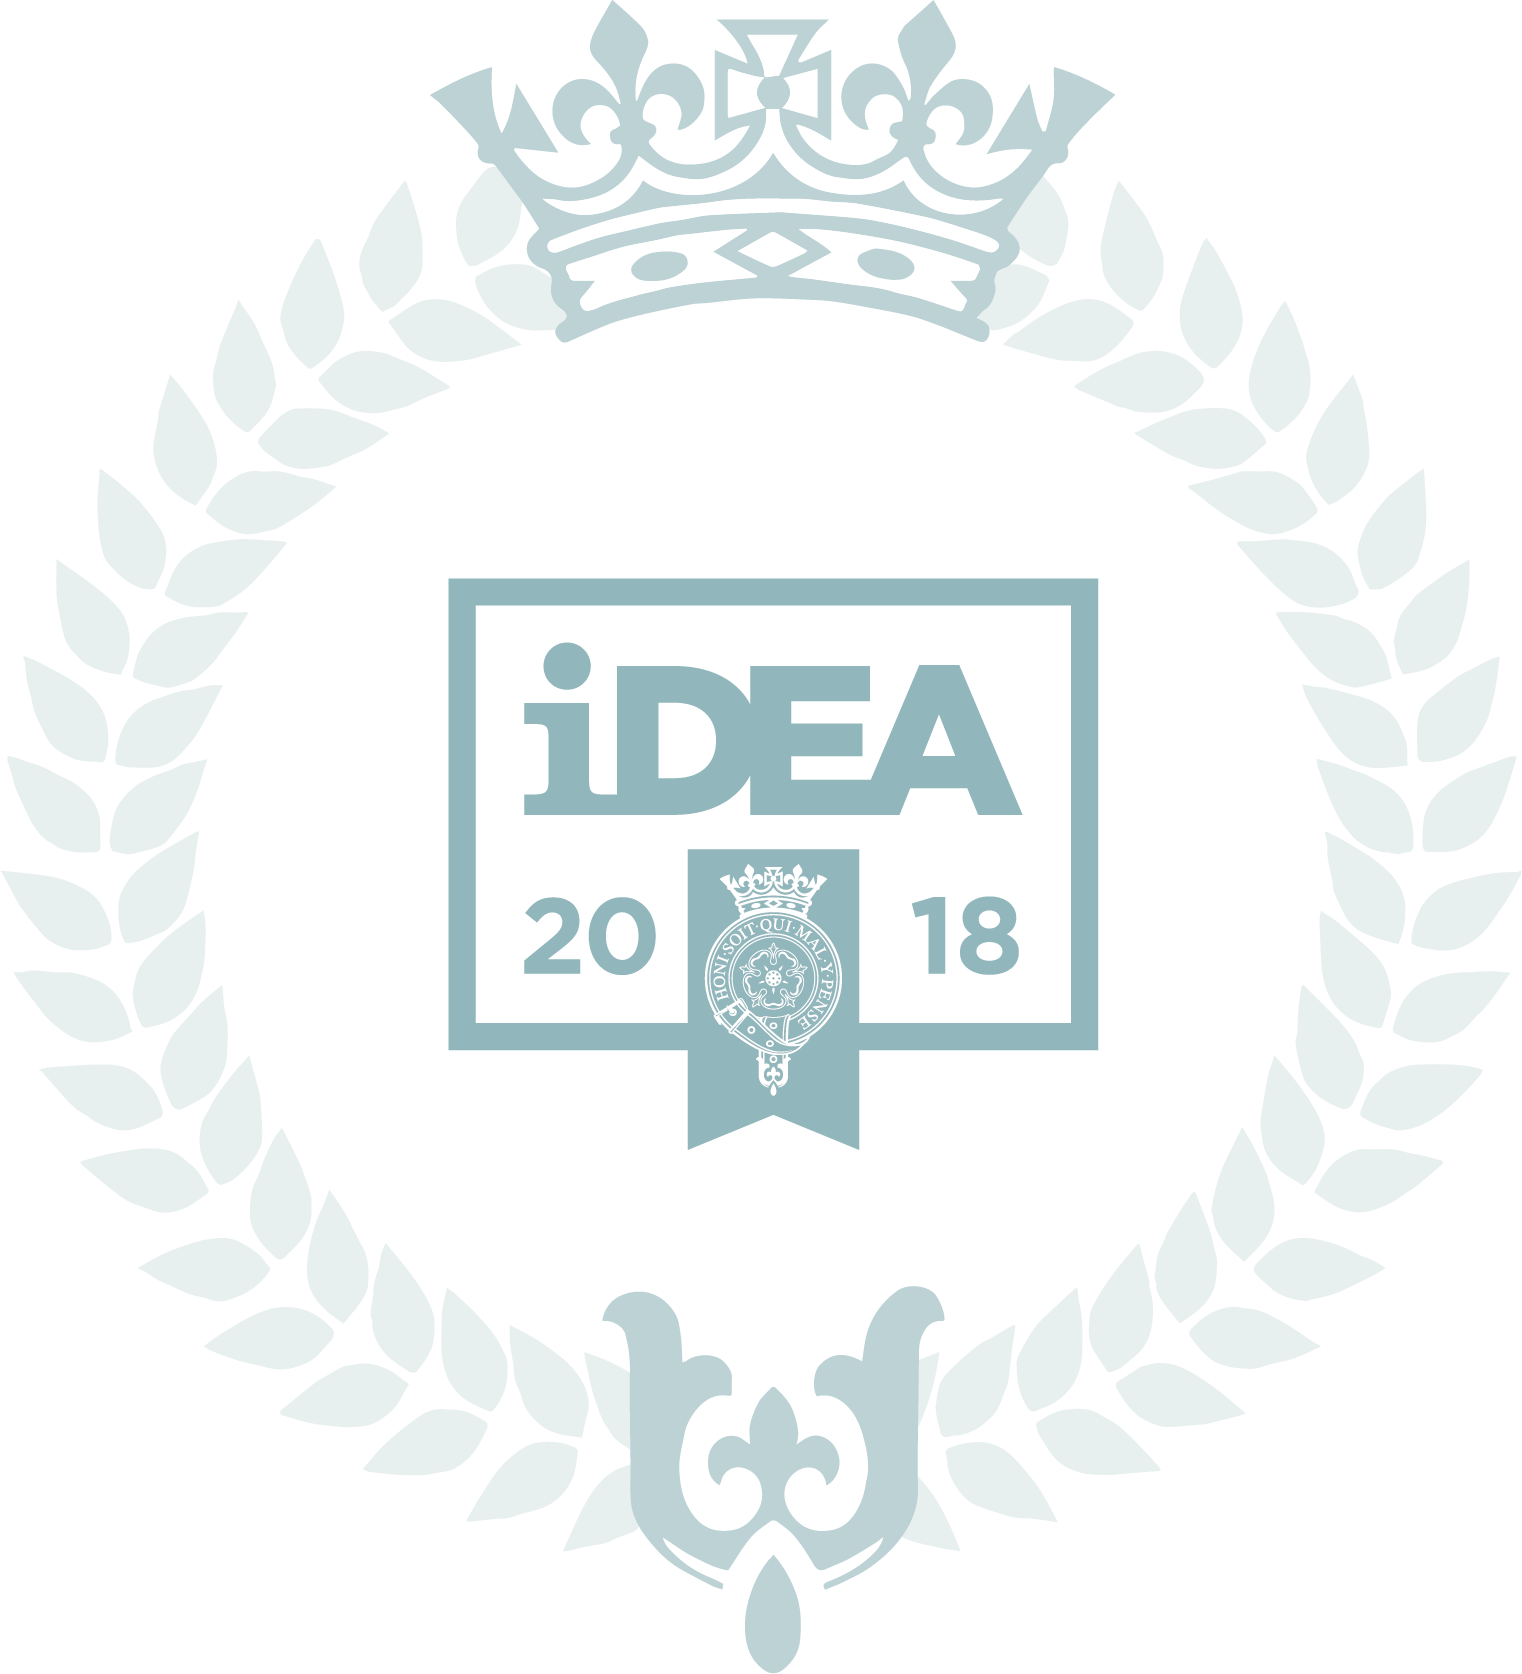 The Duke of York Inspiring Digital Enterprise Award (iDEA) Silver Award wreath logo 2018